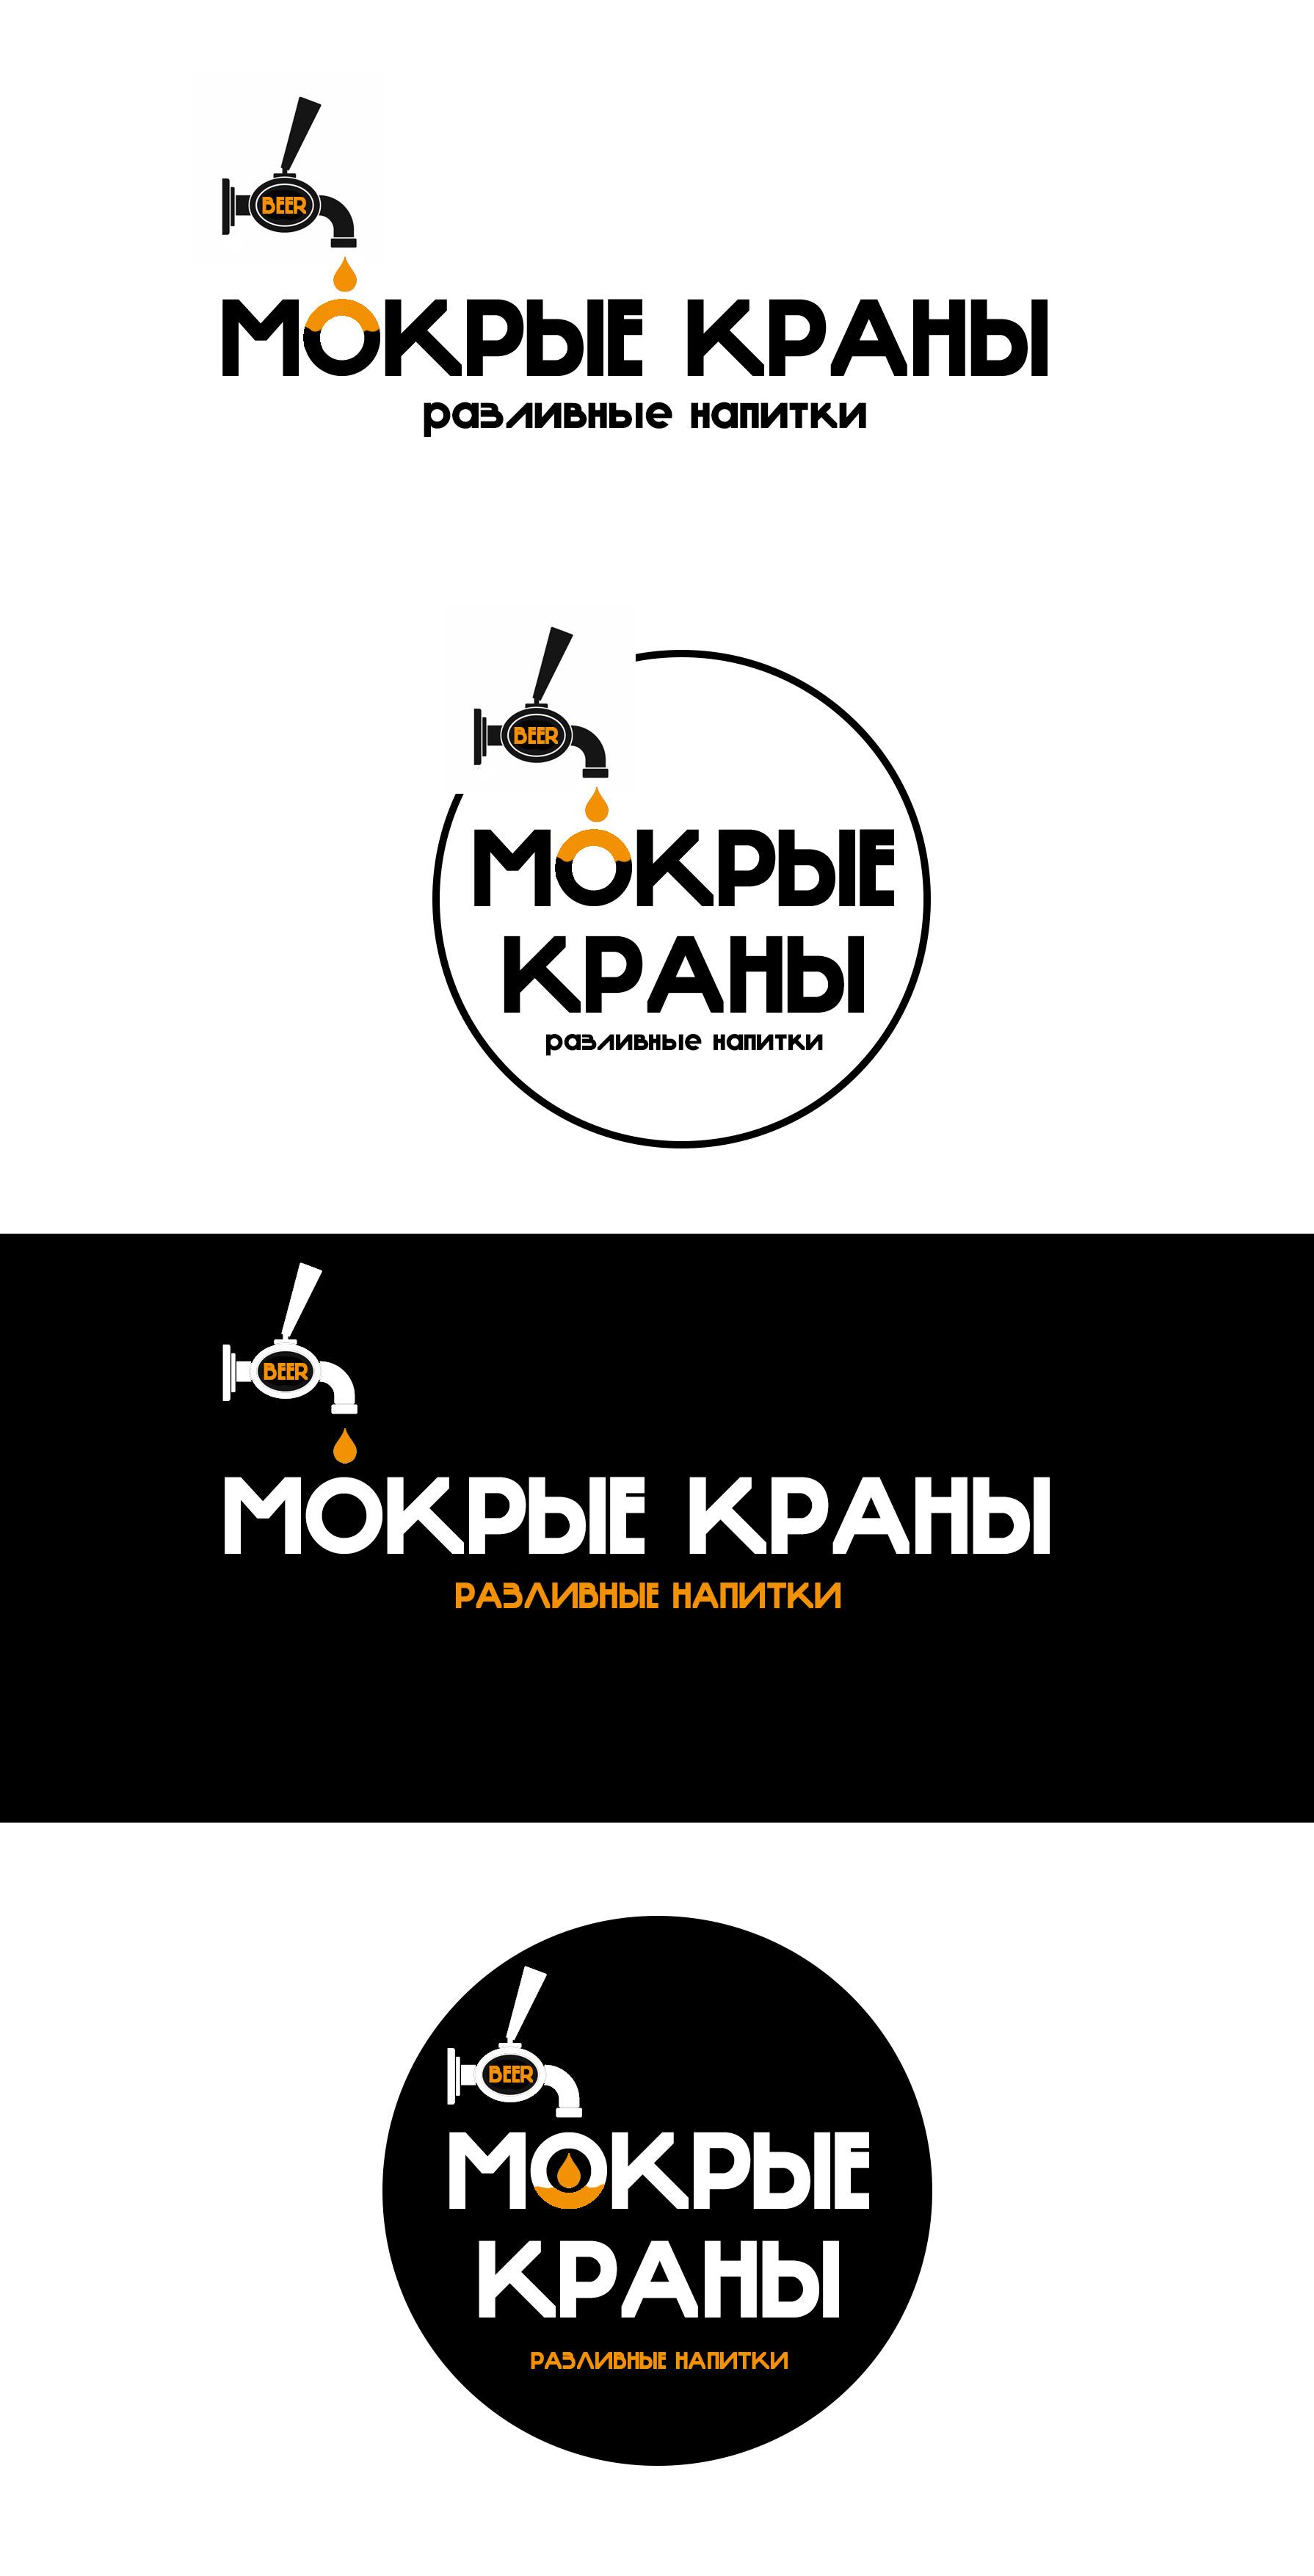 Вывеска/логотип для пивного магазина фото f_28560294d210f8b4.jpg